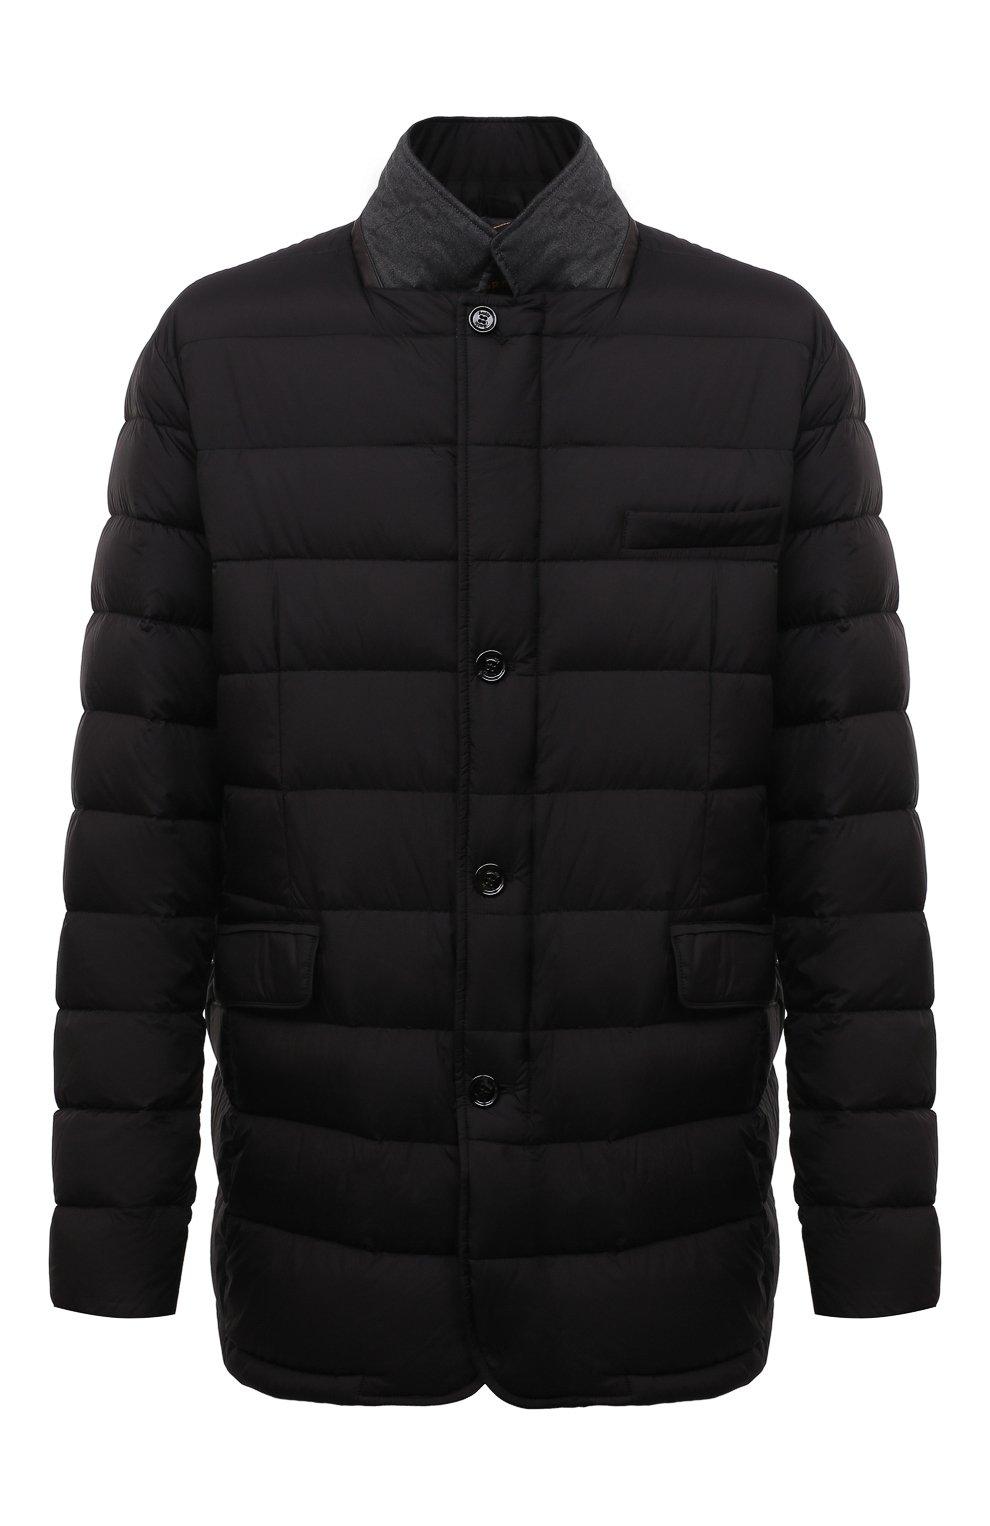 Мужская пуховая куртка zayn-op MOORER черного цвета, арт. ZAYN-0P/M0UGI100307-TEPA017/60-68   Фото 1 (Кросс-КТ: Куртка, Пуховик; Мужское Кросс-КТ: пуховик-короткий; Рукава: Длинные; Материал внешний: Синтетический материал; Стили: Классический; Материал подклада: Синтетический материал)